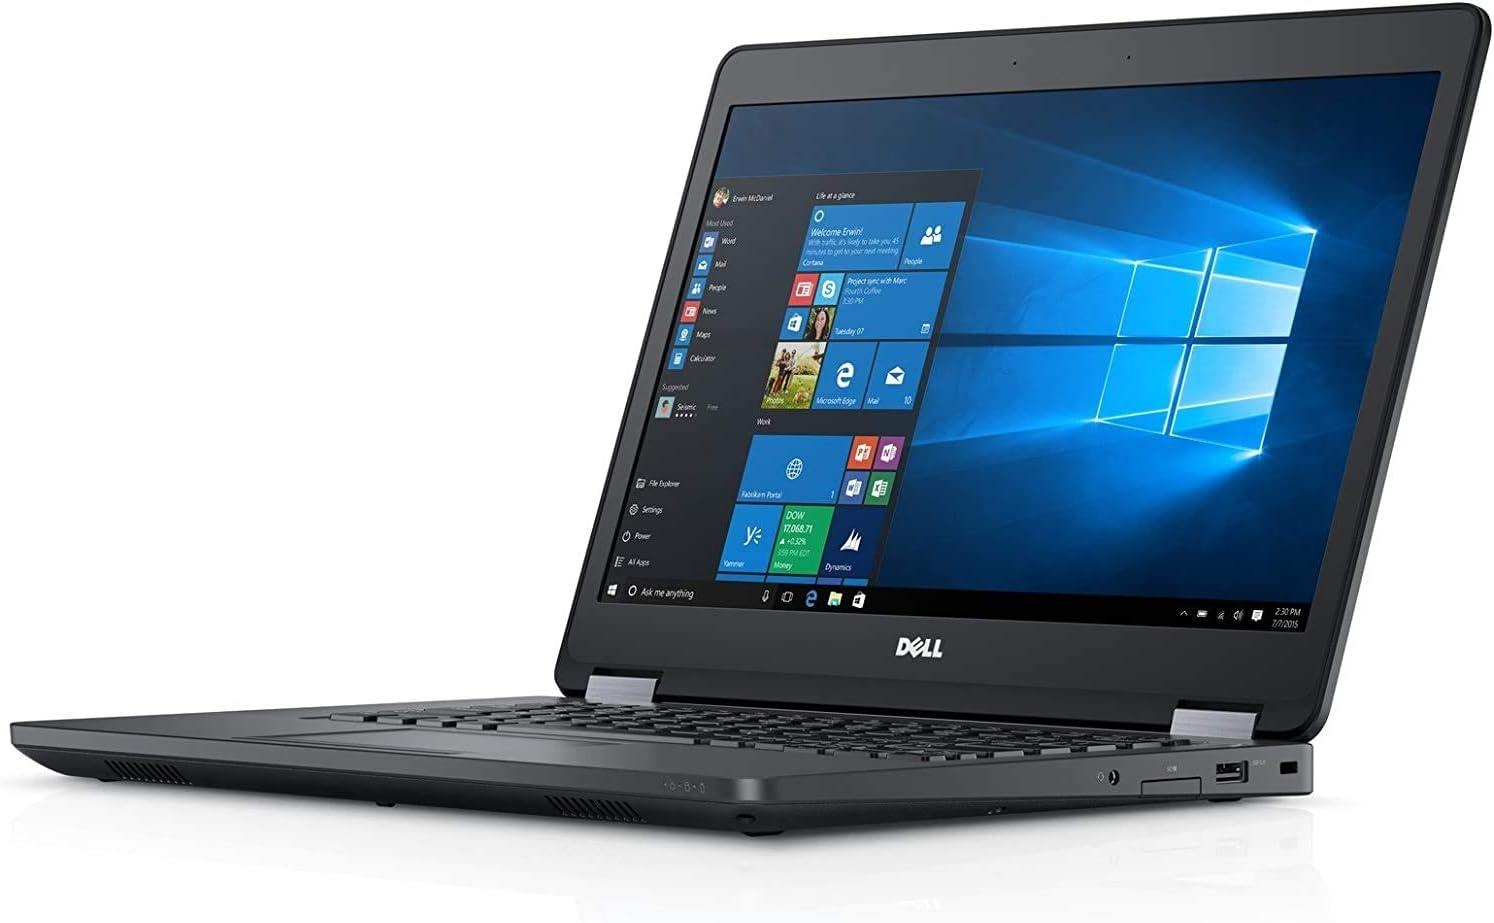 Fast Dell Latitude E5470 HD Business Laptop Notebook PC - No Webcam - (Intel Core i5-6300U, 8GB Ram, 256GB Solid State SSD, HDMI, NO-Camera, WiFi, SC Card Reader   Win 10 Pro (Renewed).